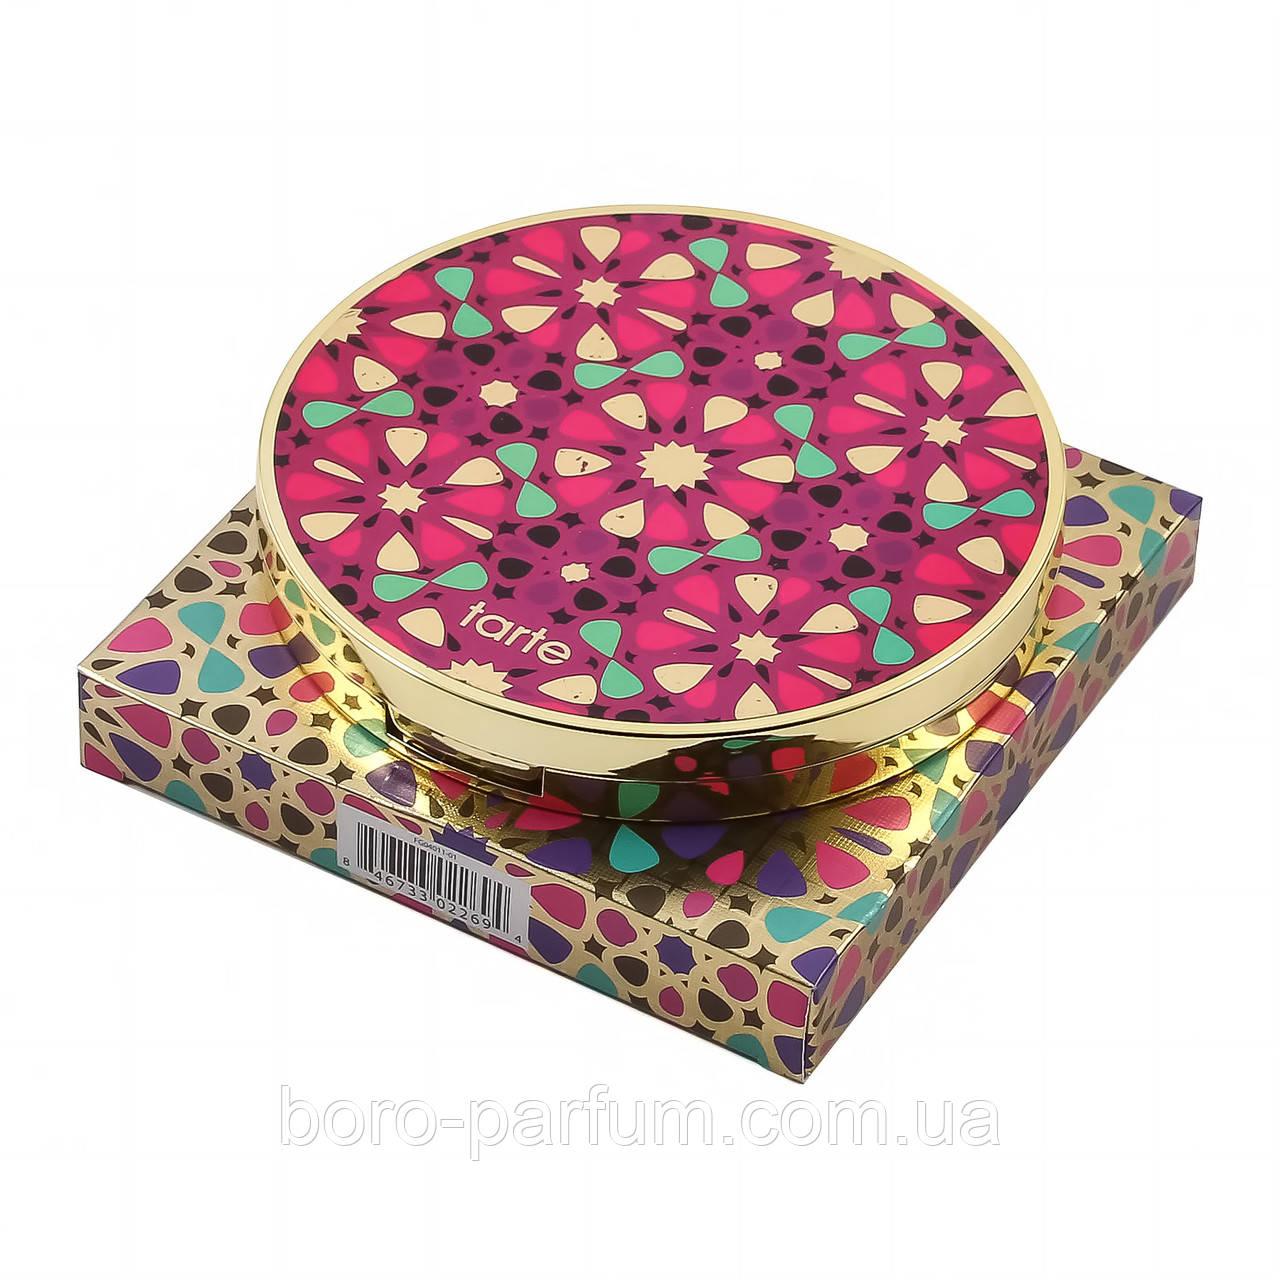 Румяна Tarte Blush Bazaar